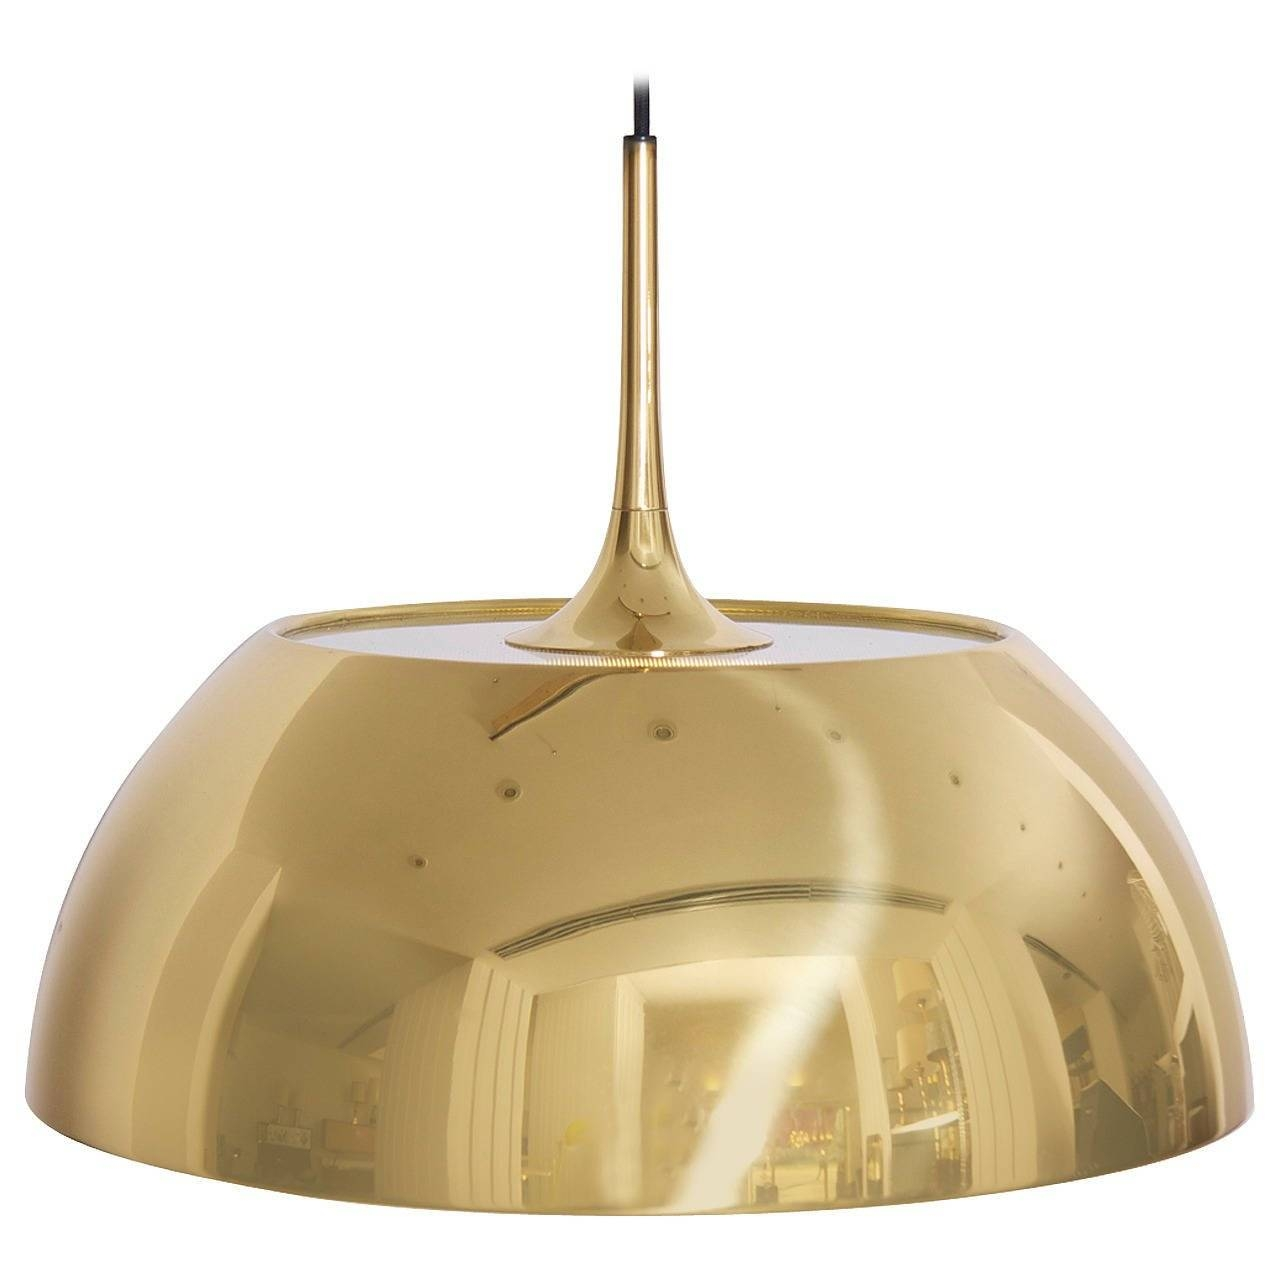 Florian Schulz Brass Ceos 40 Counterweight Pendant Lamp At 1Stdibs With Counterweight Pendant Lights (View 5 of 15)